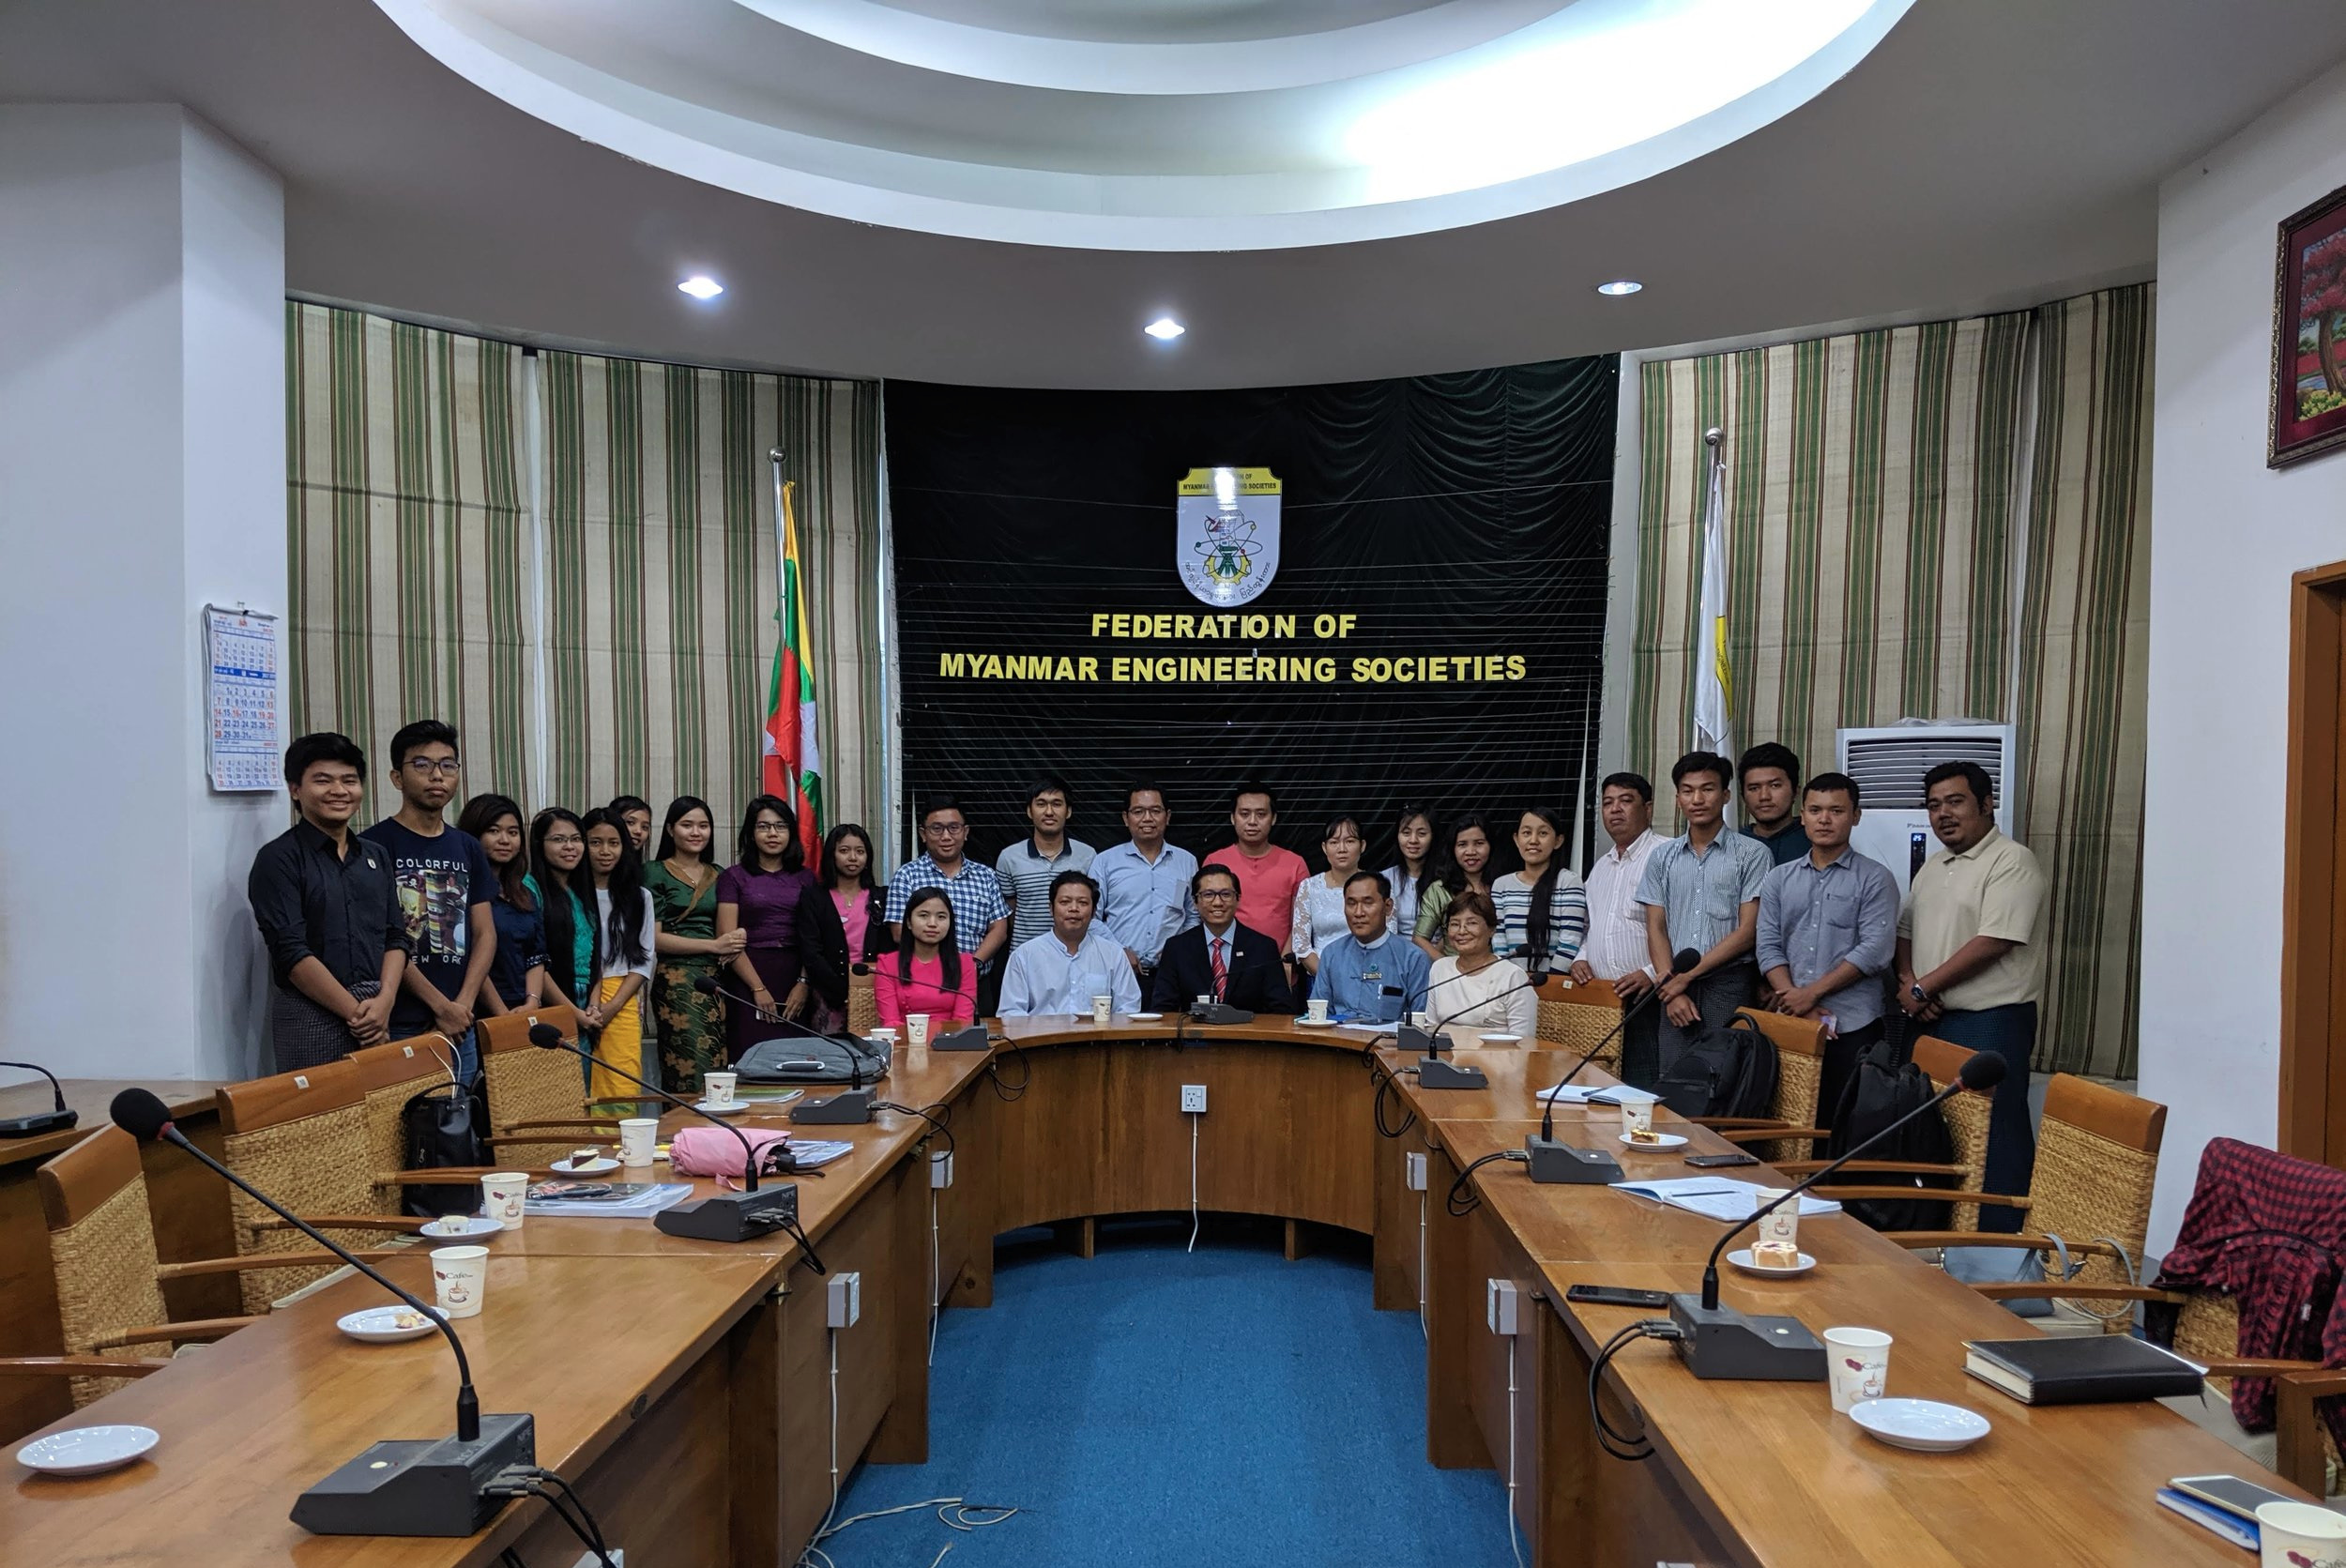 Dr. kyne conducting another seminar on disaster resiliency at the Federation of Myanmar Engineering Societies, Yangon, Myanmar on July 8, 2019.